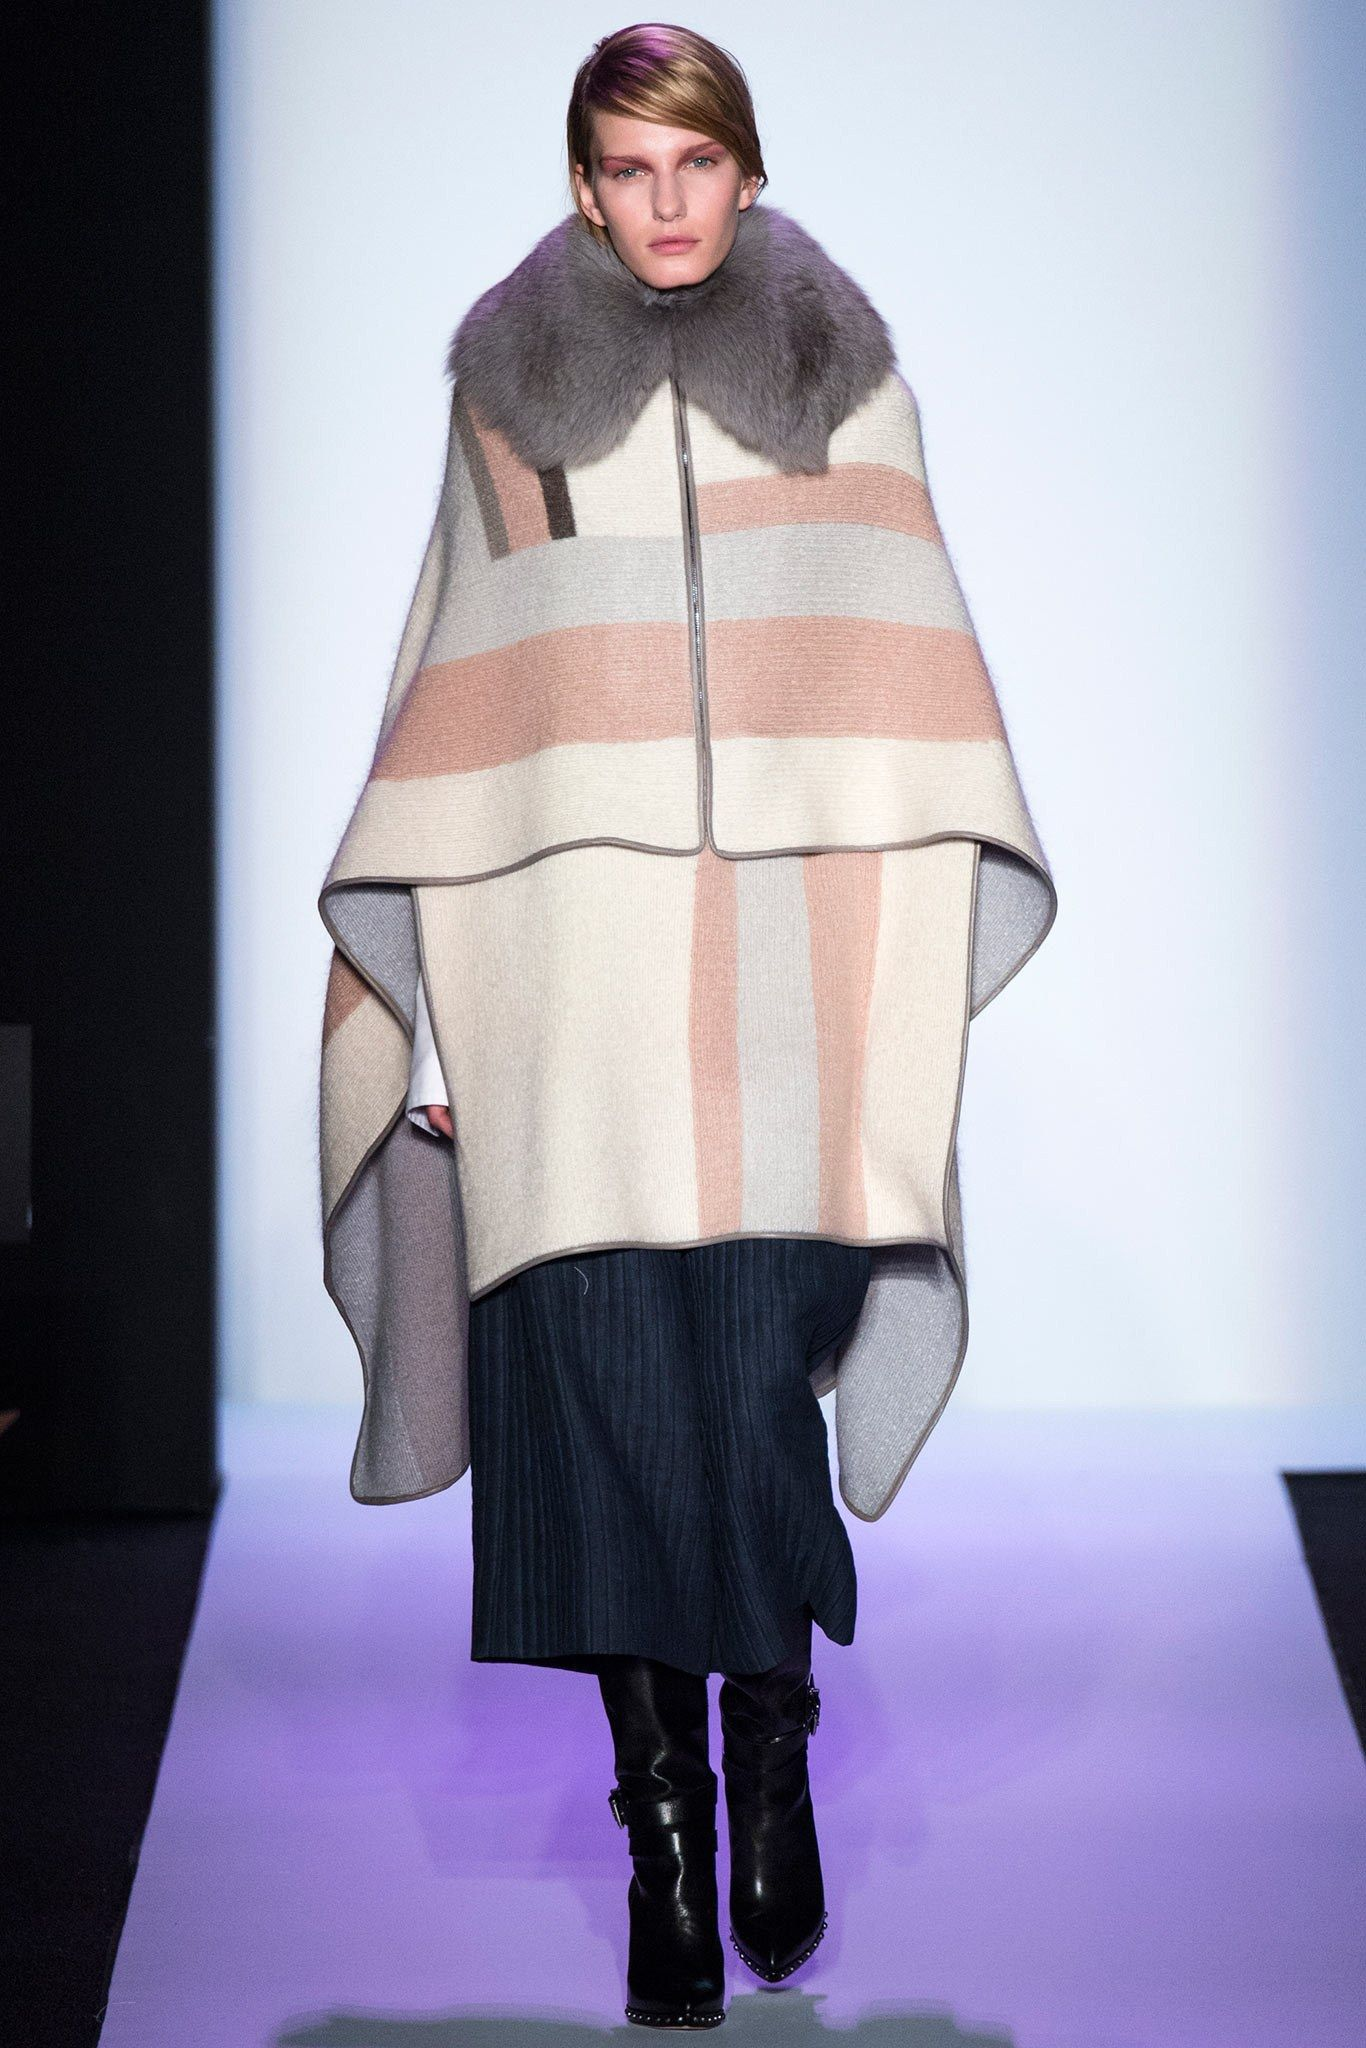 BCBG Max Azria Fall 2014 Ready-to-Wear Fashion Show